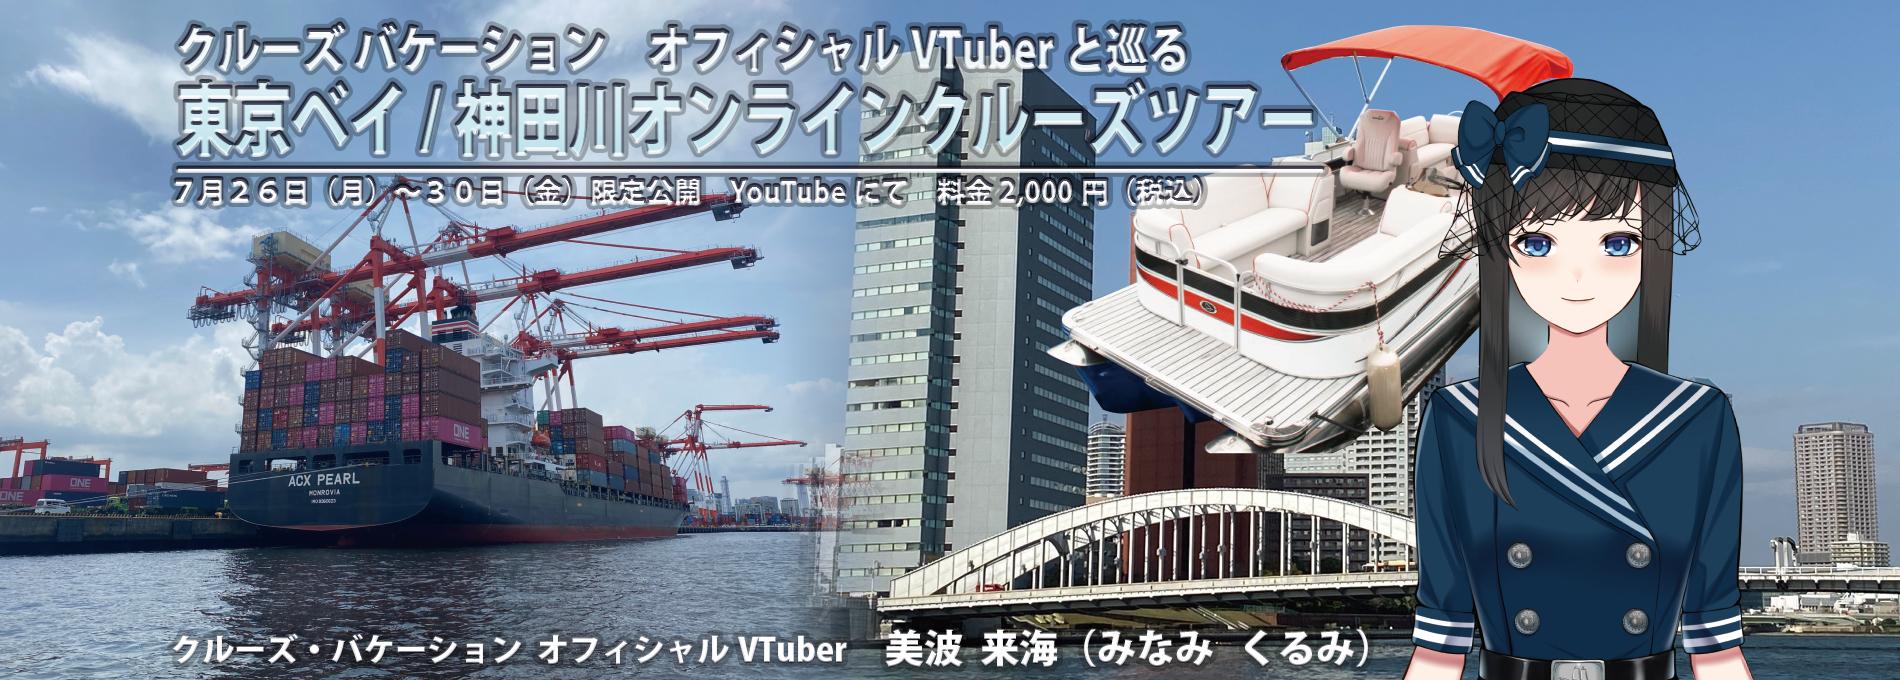 VTuber オンラインツアー